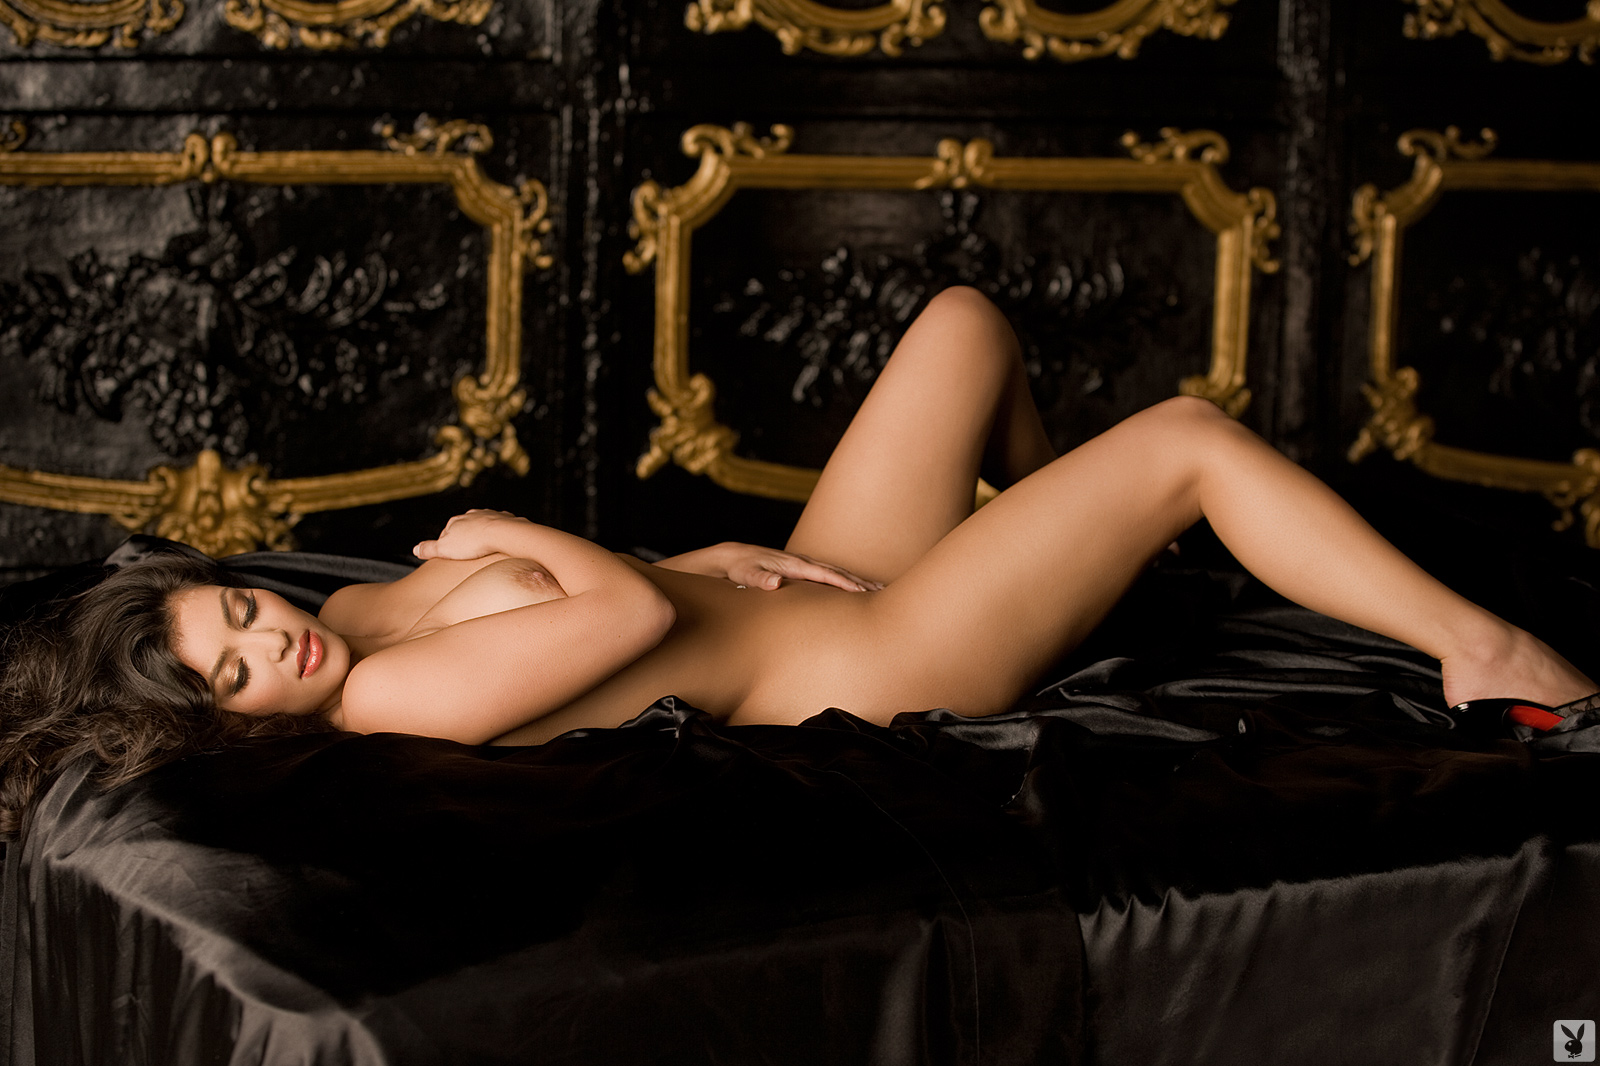 kyle-sexy-kardashians-women-naked-num-lock-video